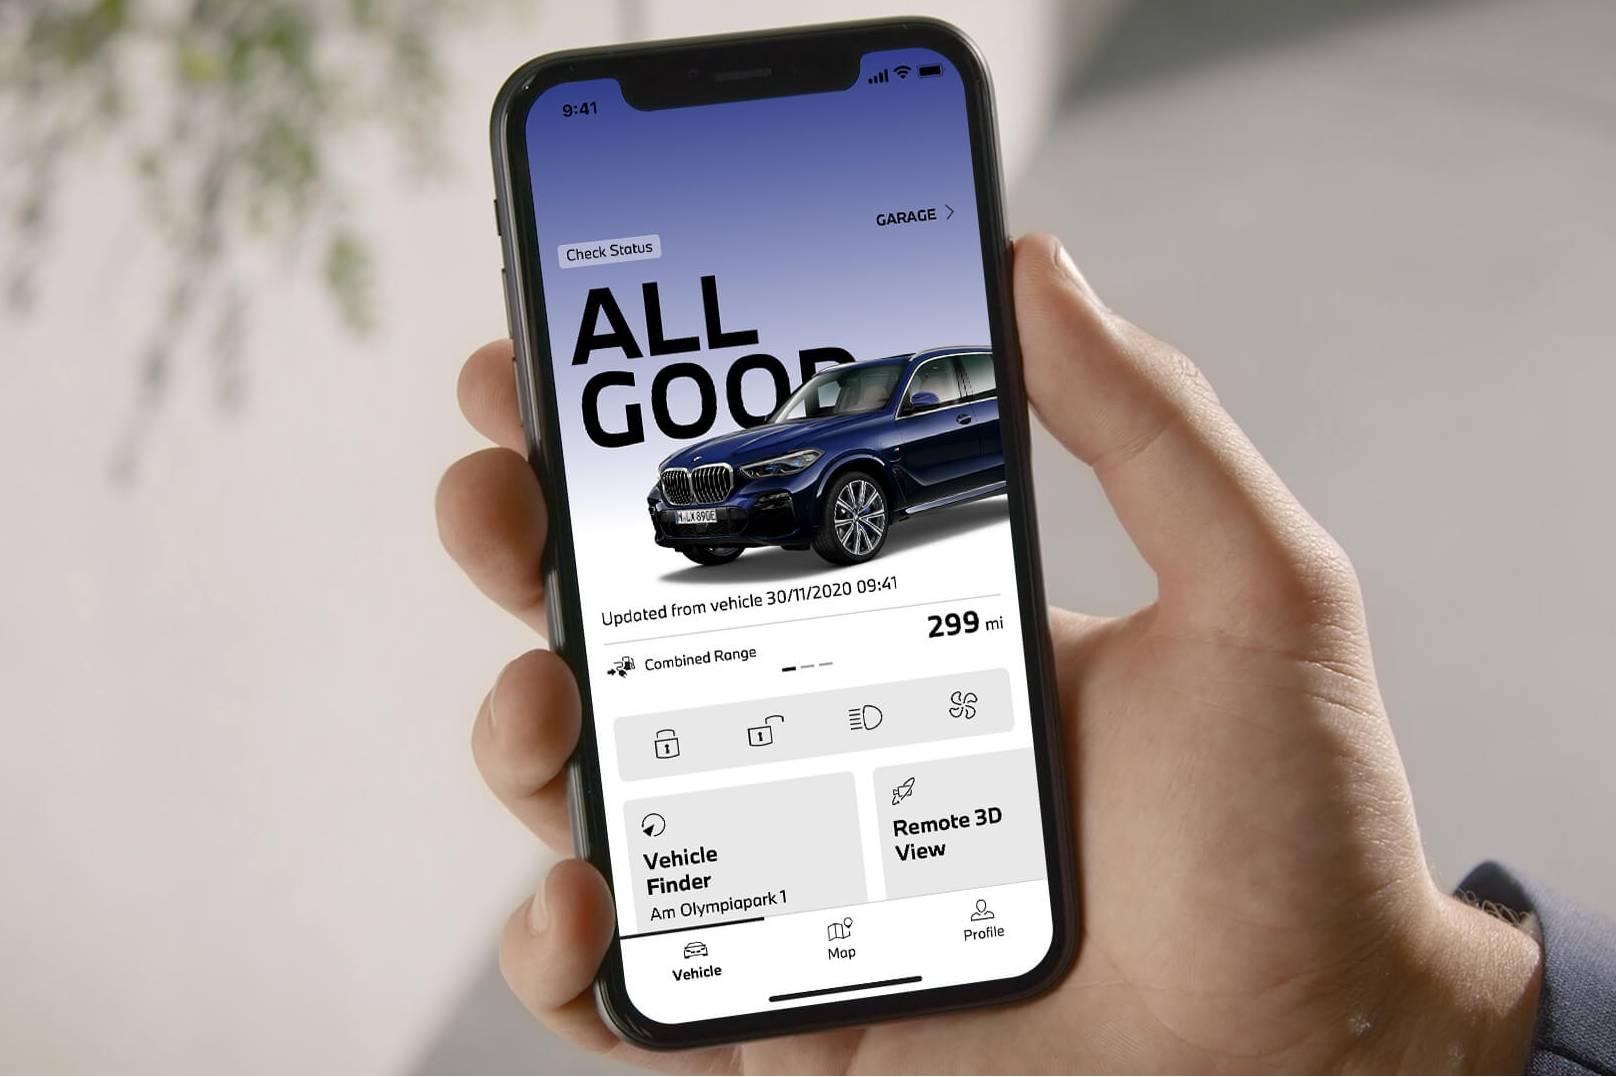 My BMW remote app